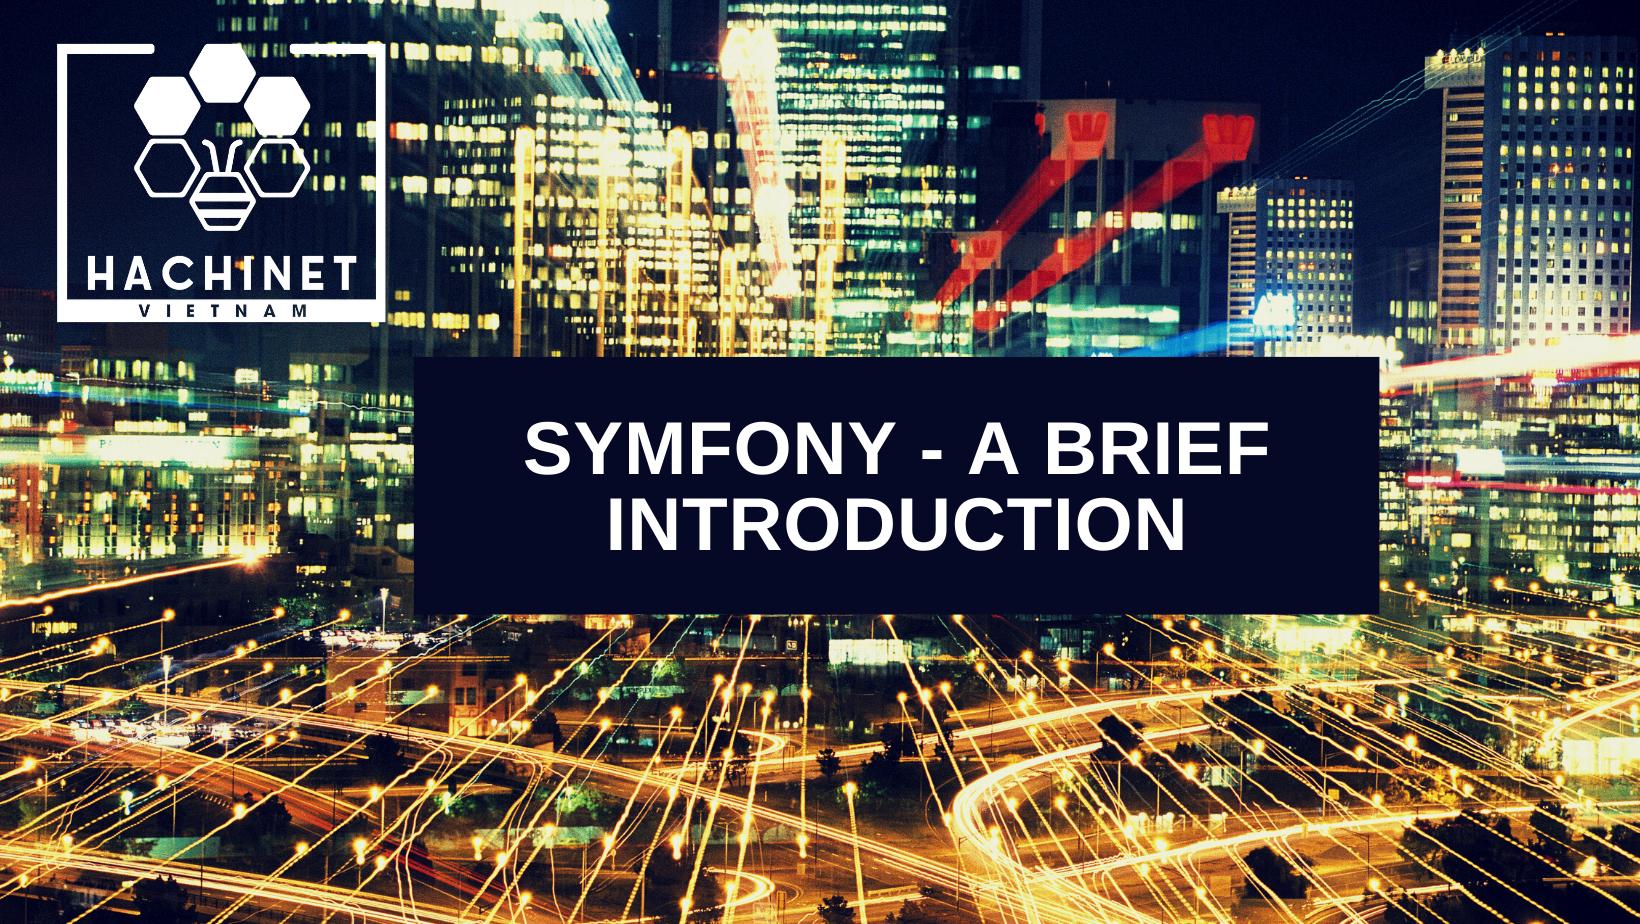 Symfony - a brief introduction